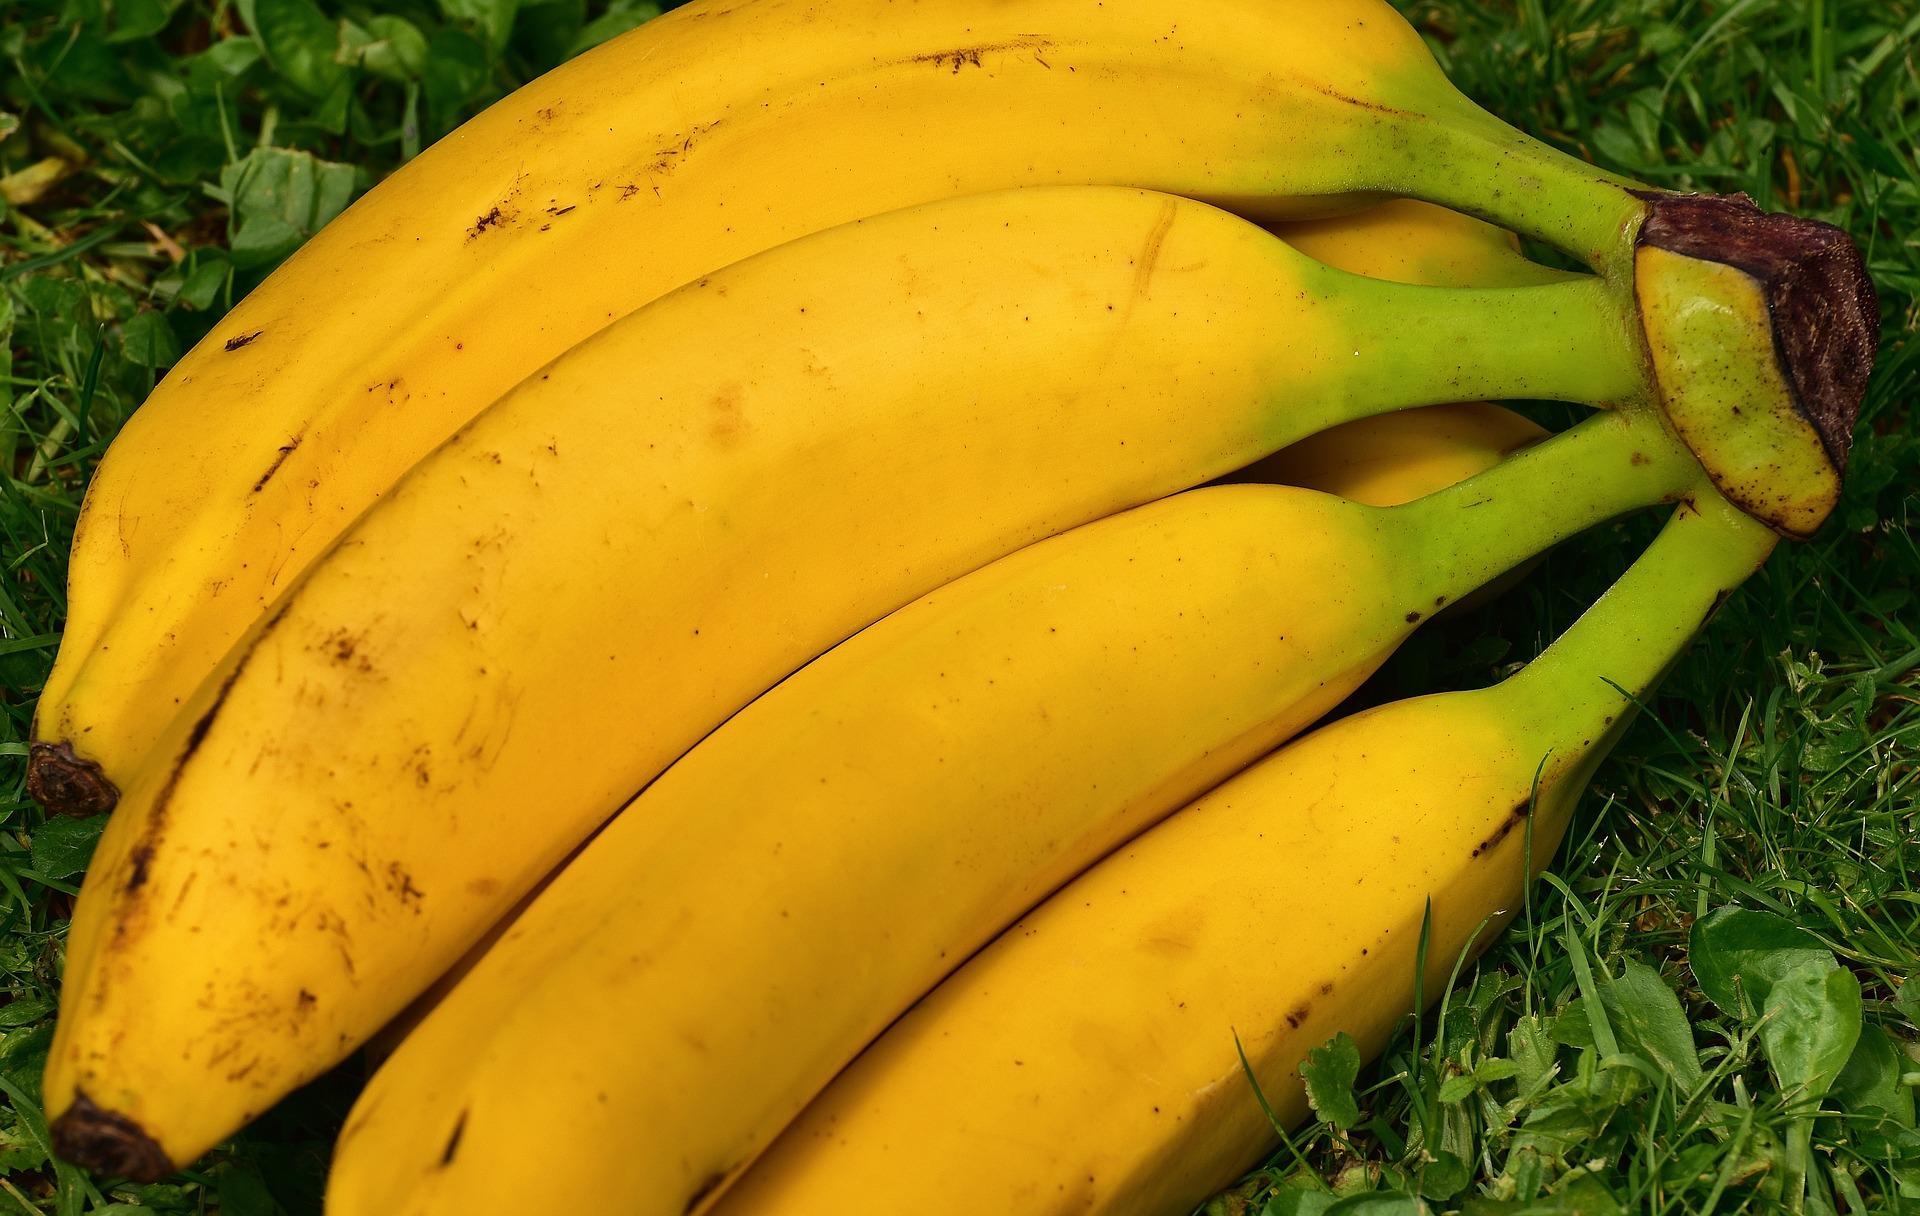 La banane - Association Miam